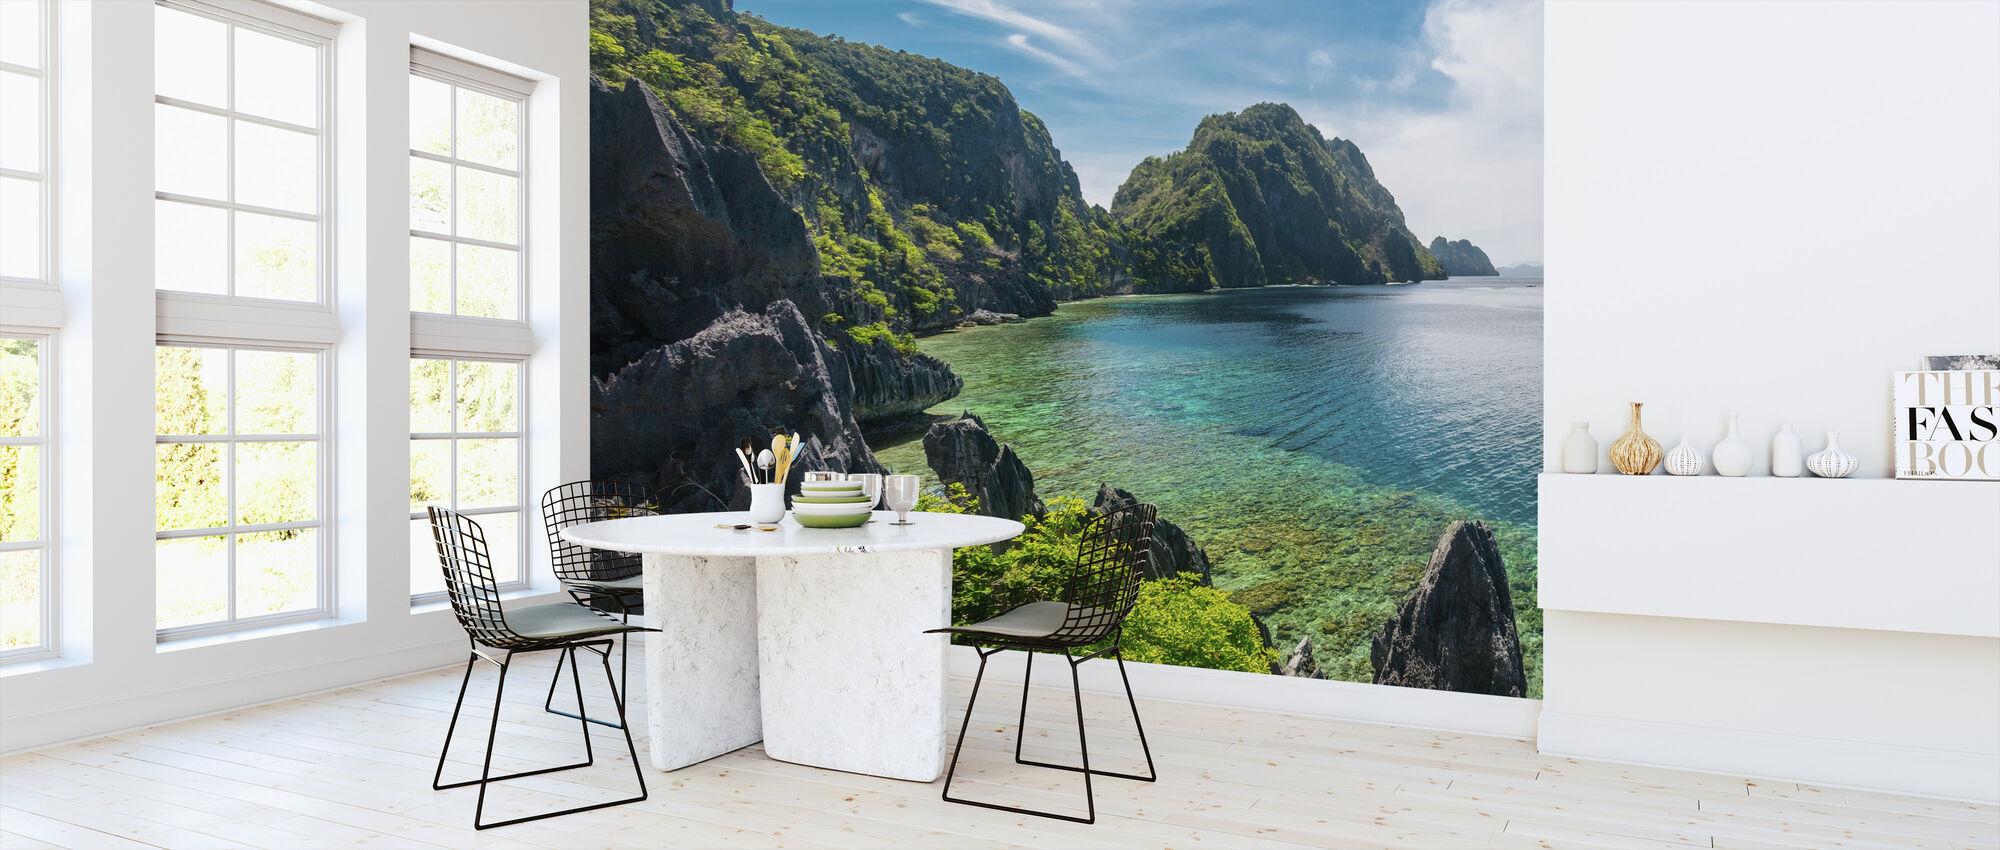 The Nido Island - Wallpaper - Kitchen